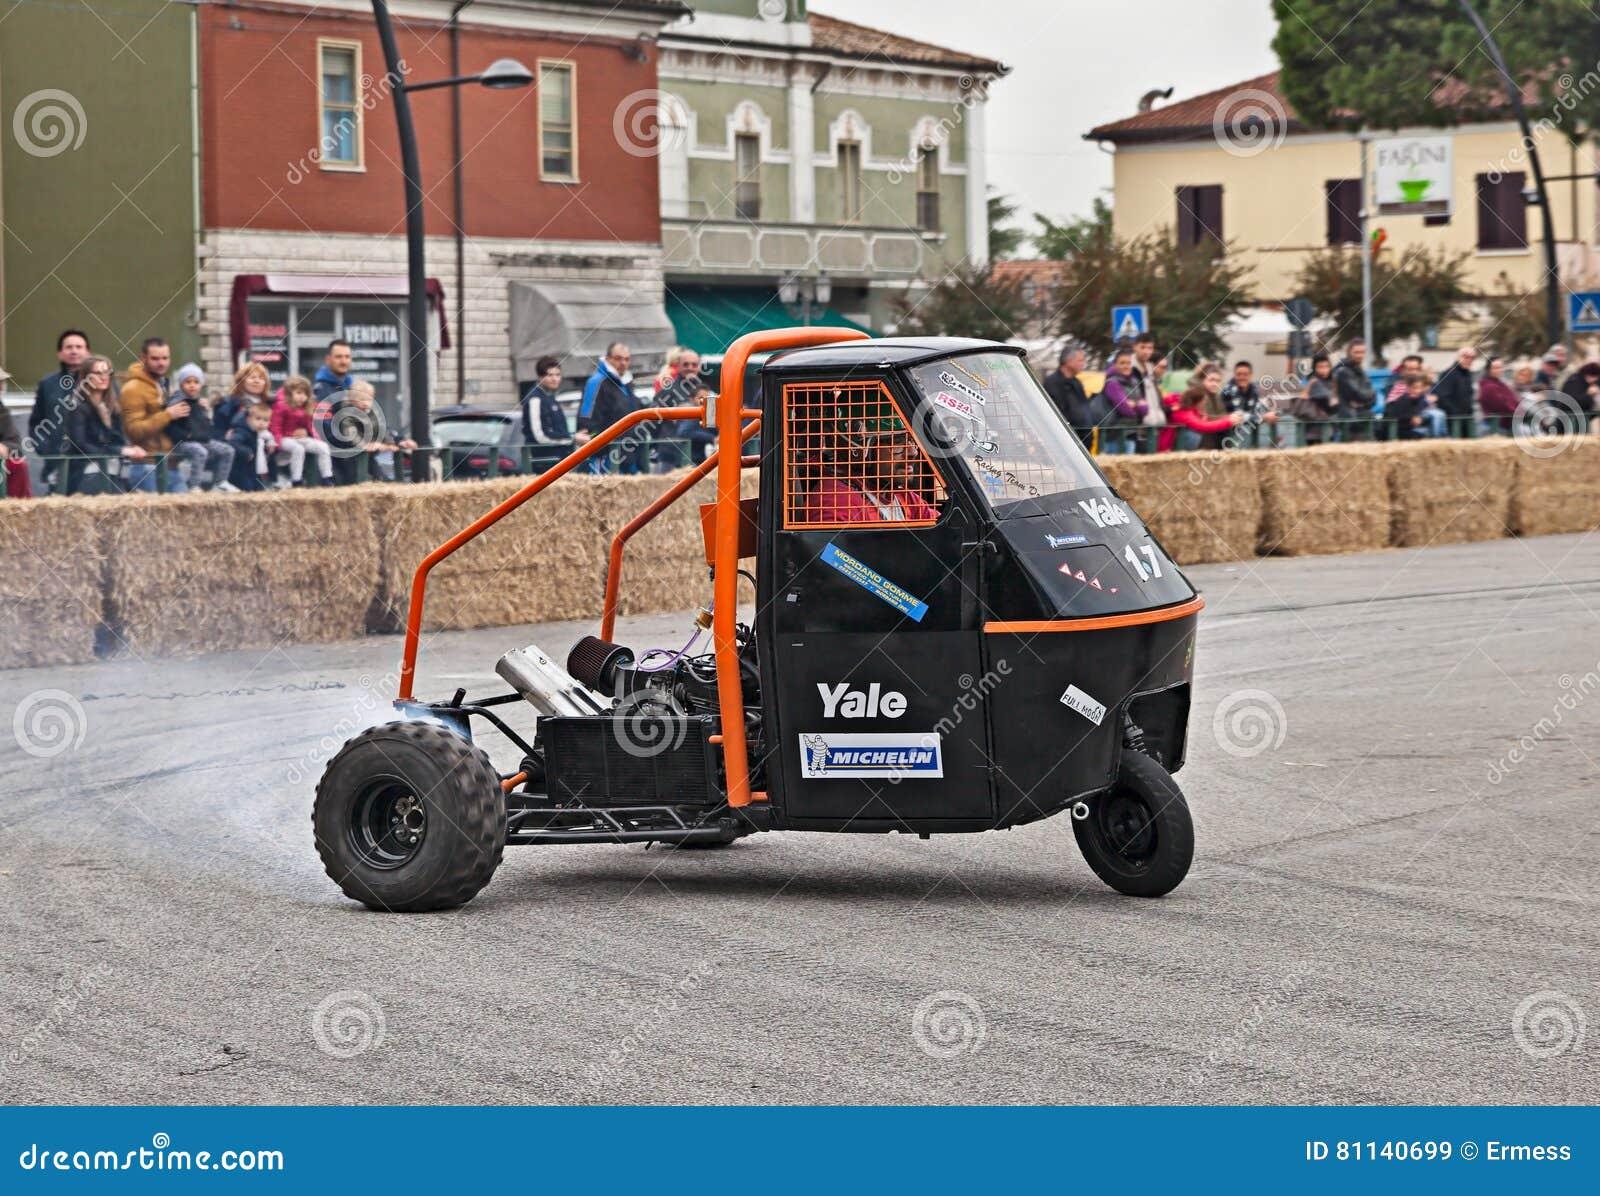 Racing Vehicle Ape Piaggio Editorial Stock Image Image